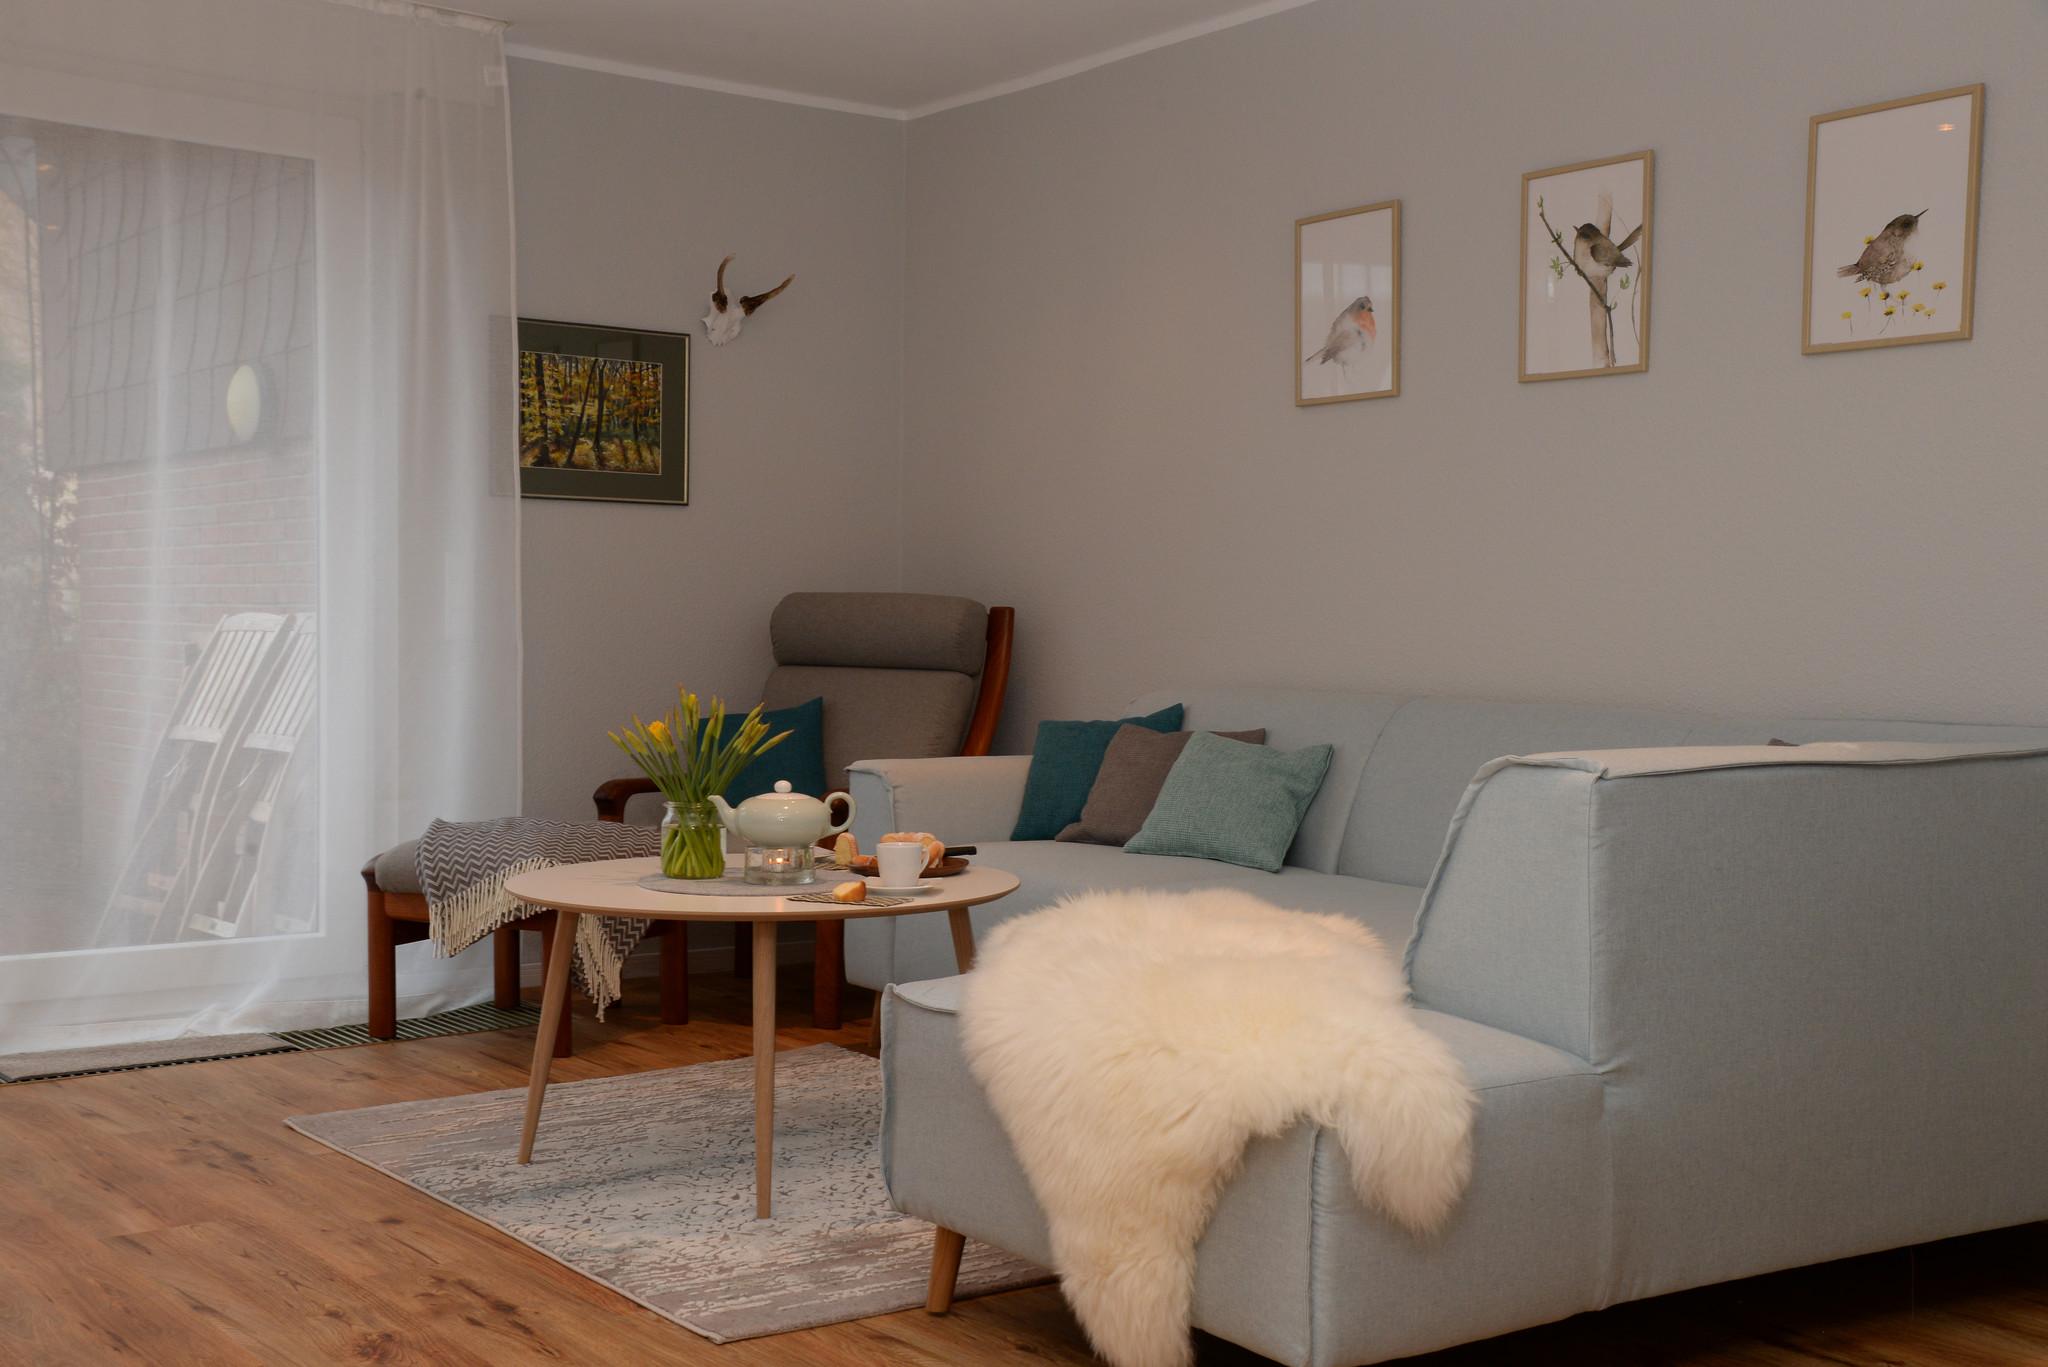 Wohnzimmer, parlors, salons